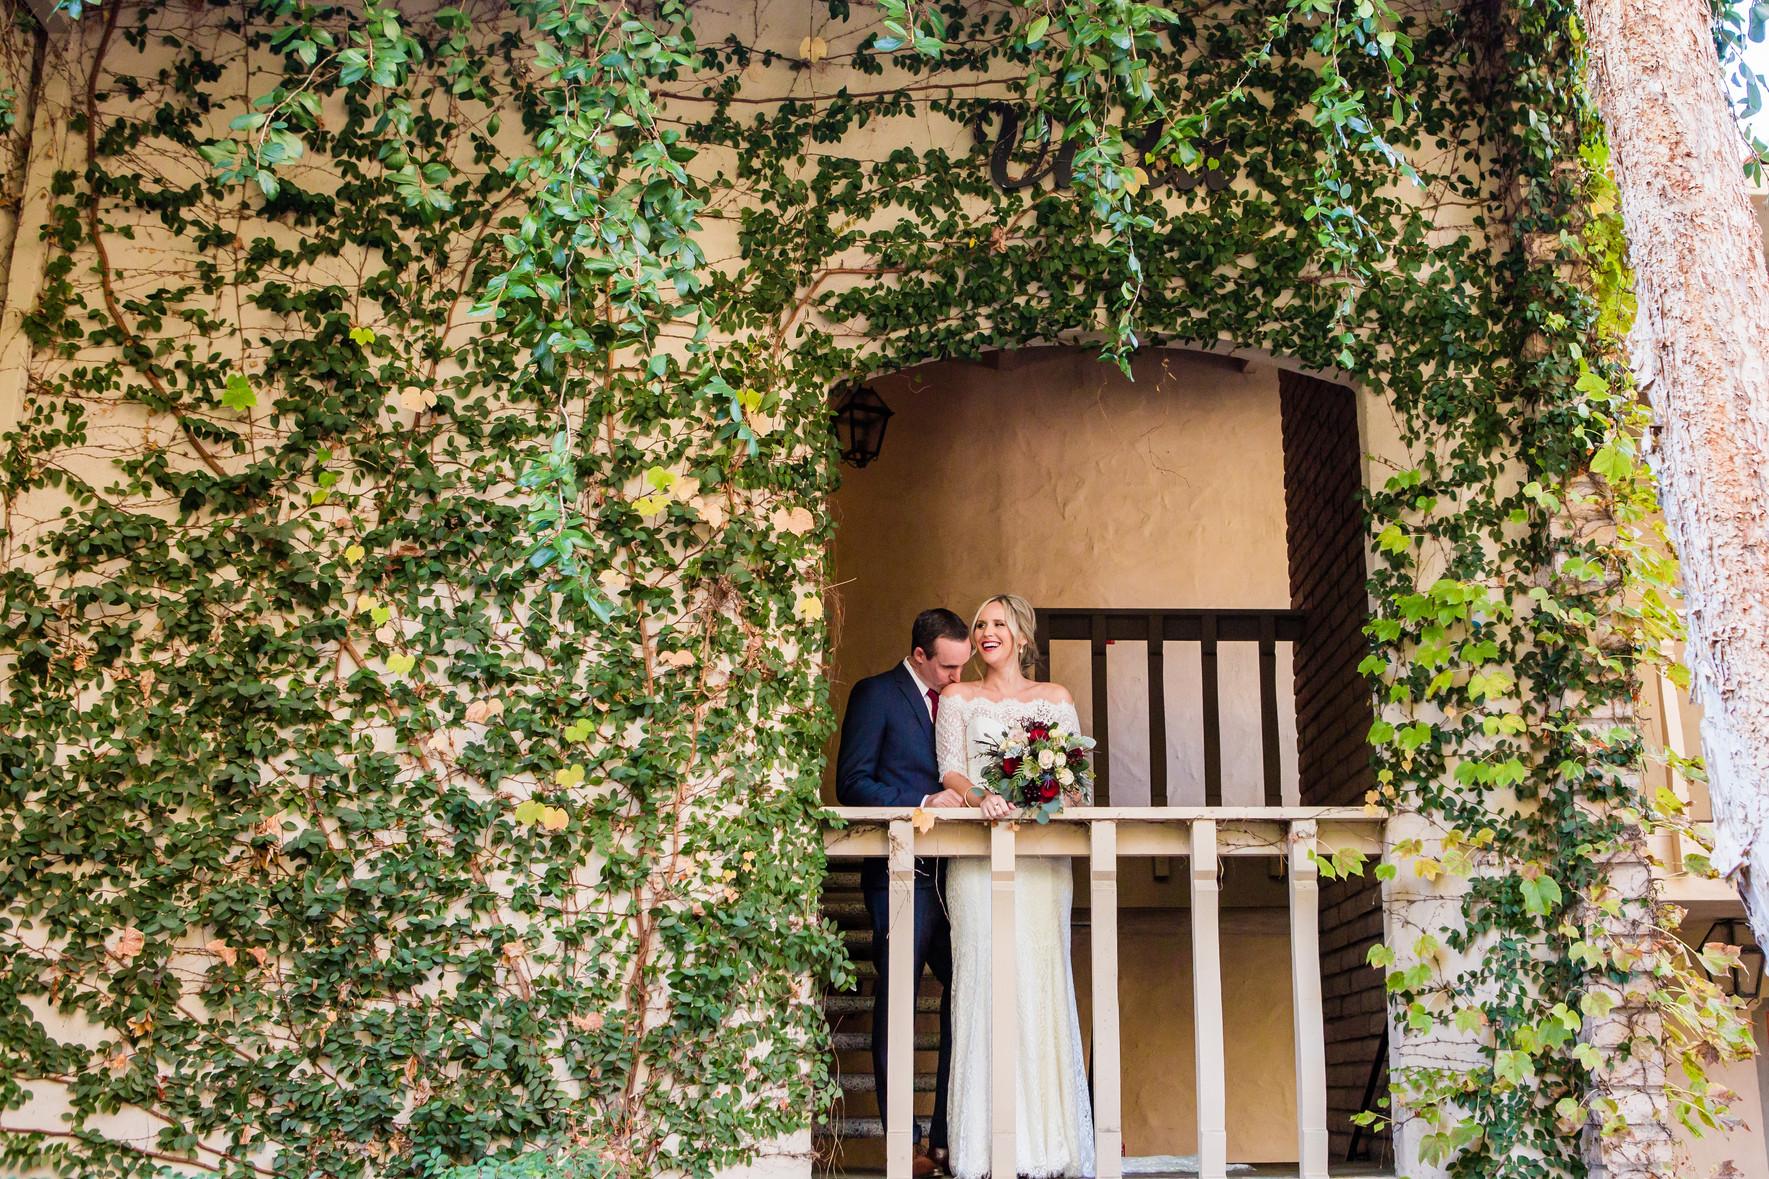 Berlynn Photography, San Diego Wedding Photography, Bride and Groom, San Diego Elopement, Adventure Wedding, Best Wedding Photography 2018, Rancho Santa Fe Wedding Photography